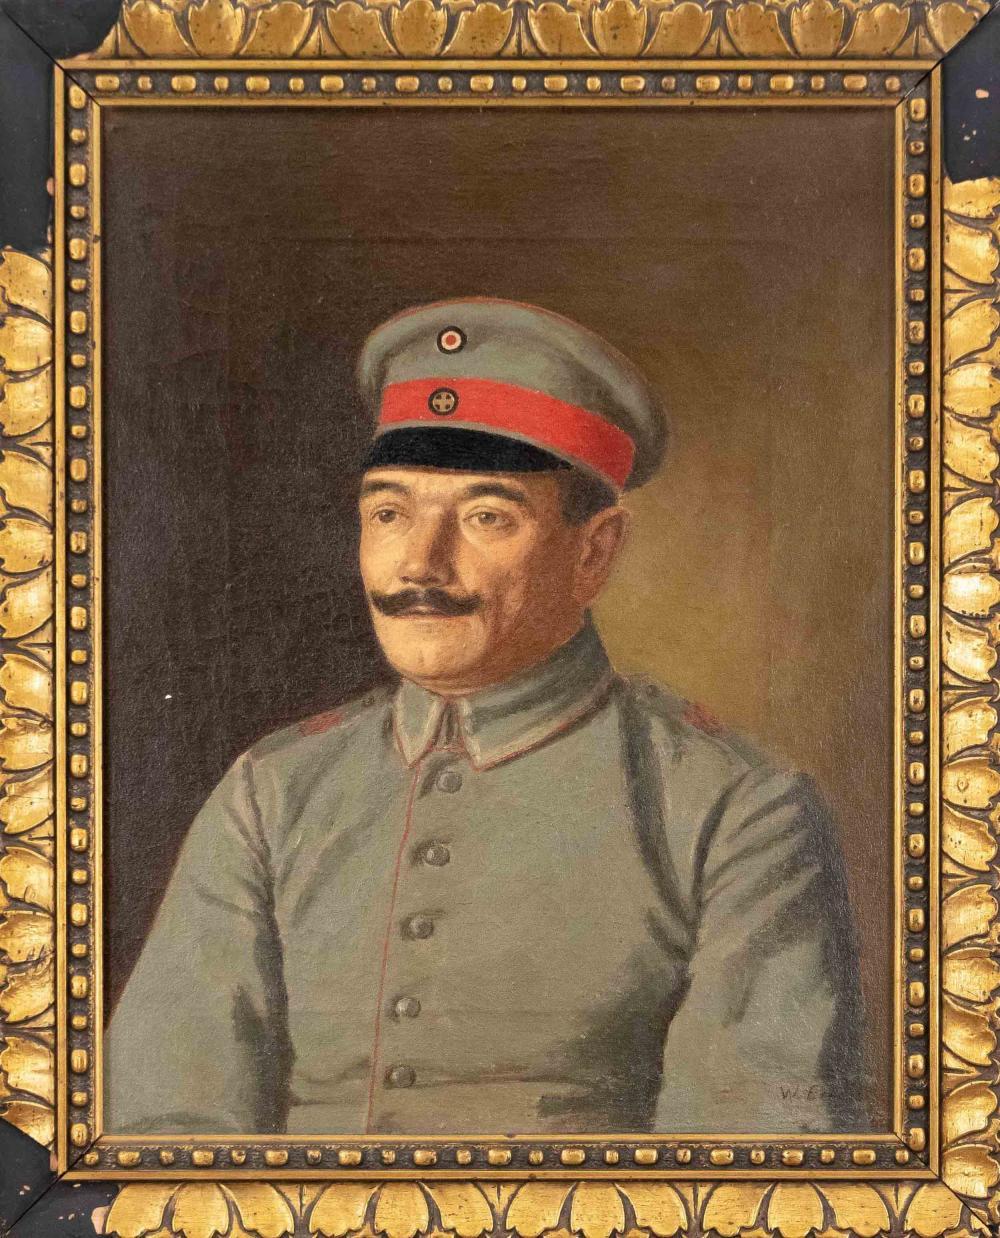 W. Eckert, portrait painter c.